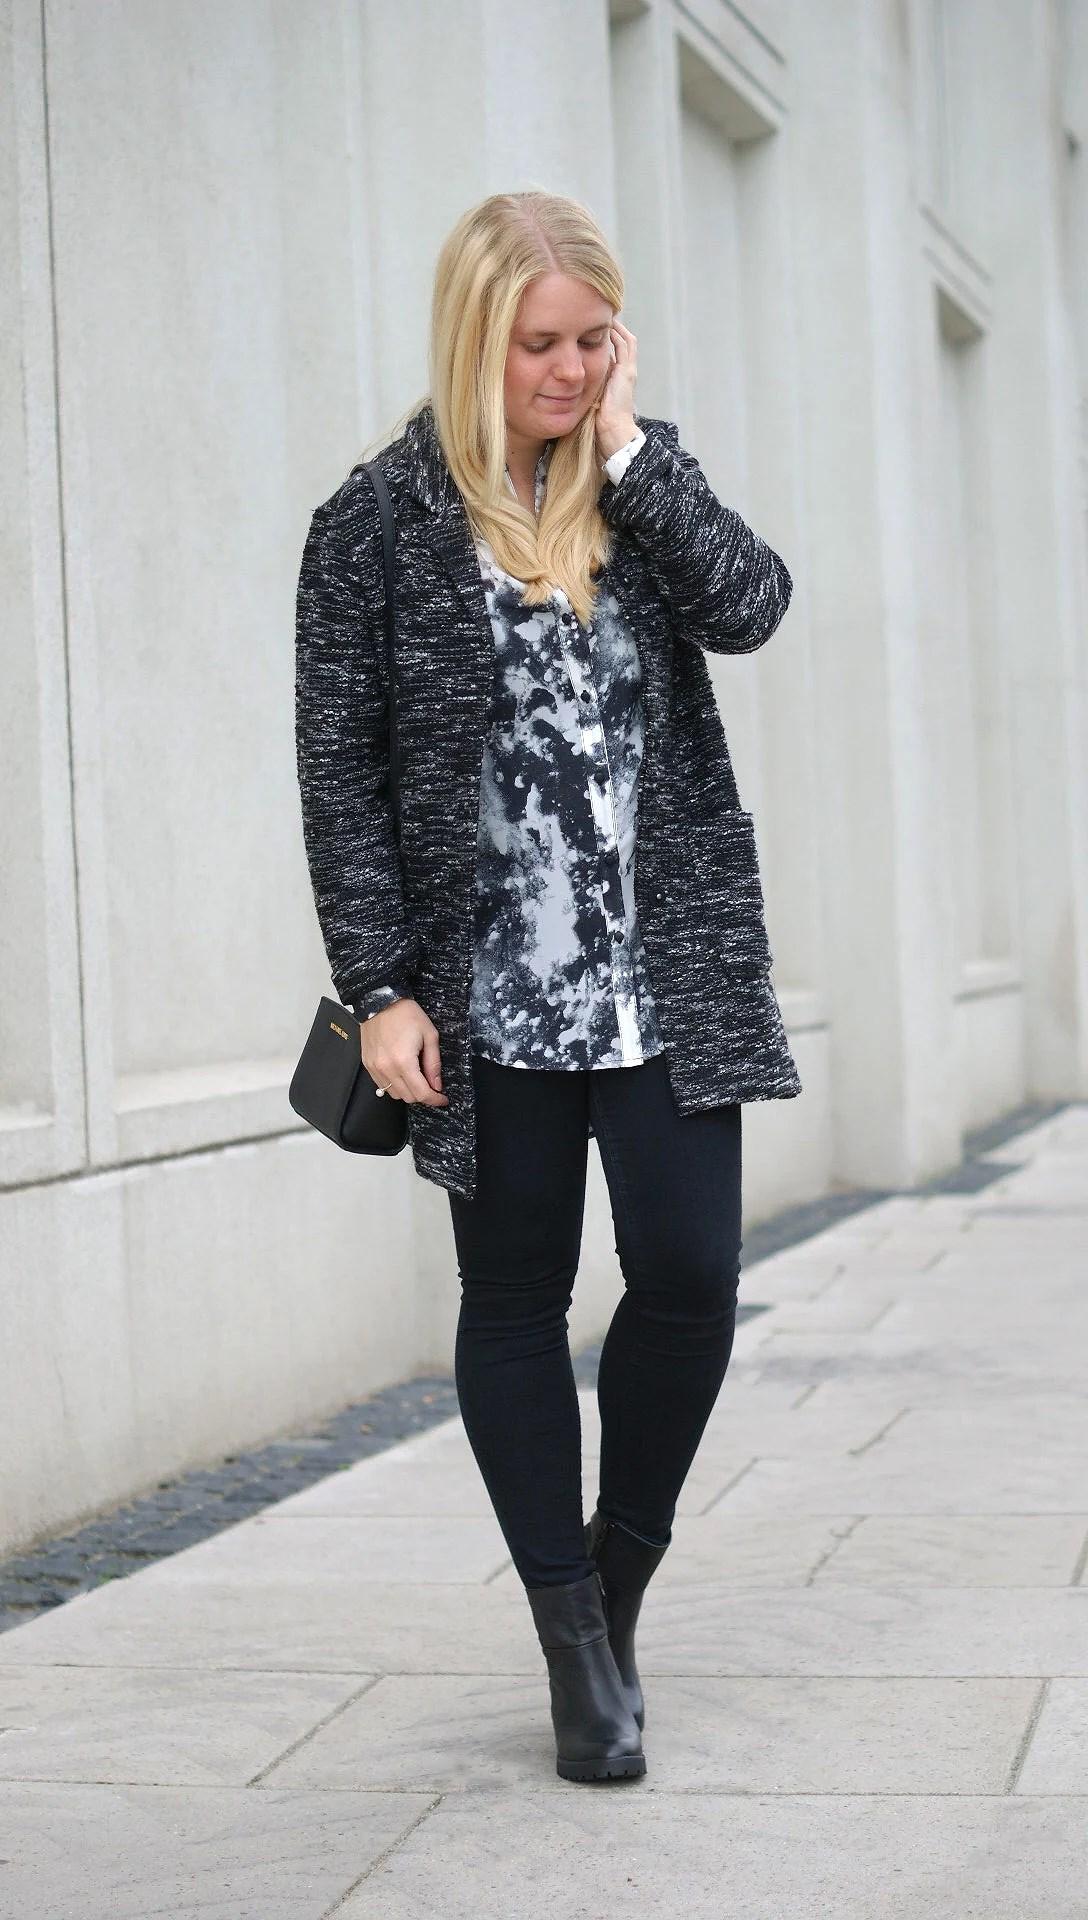 Modeblogger-michaelkors